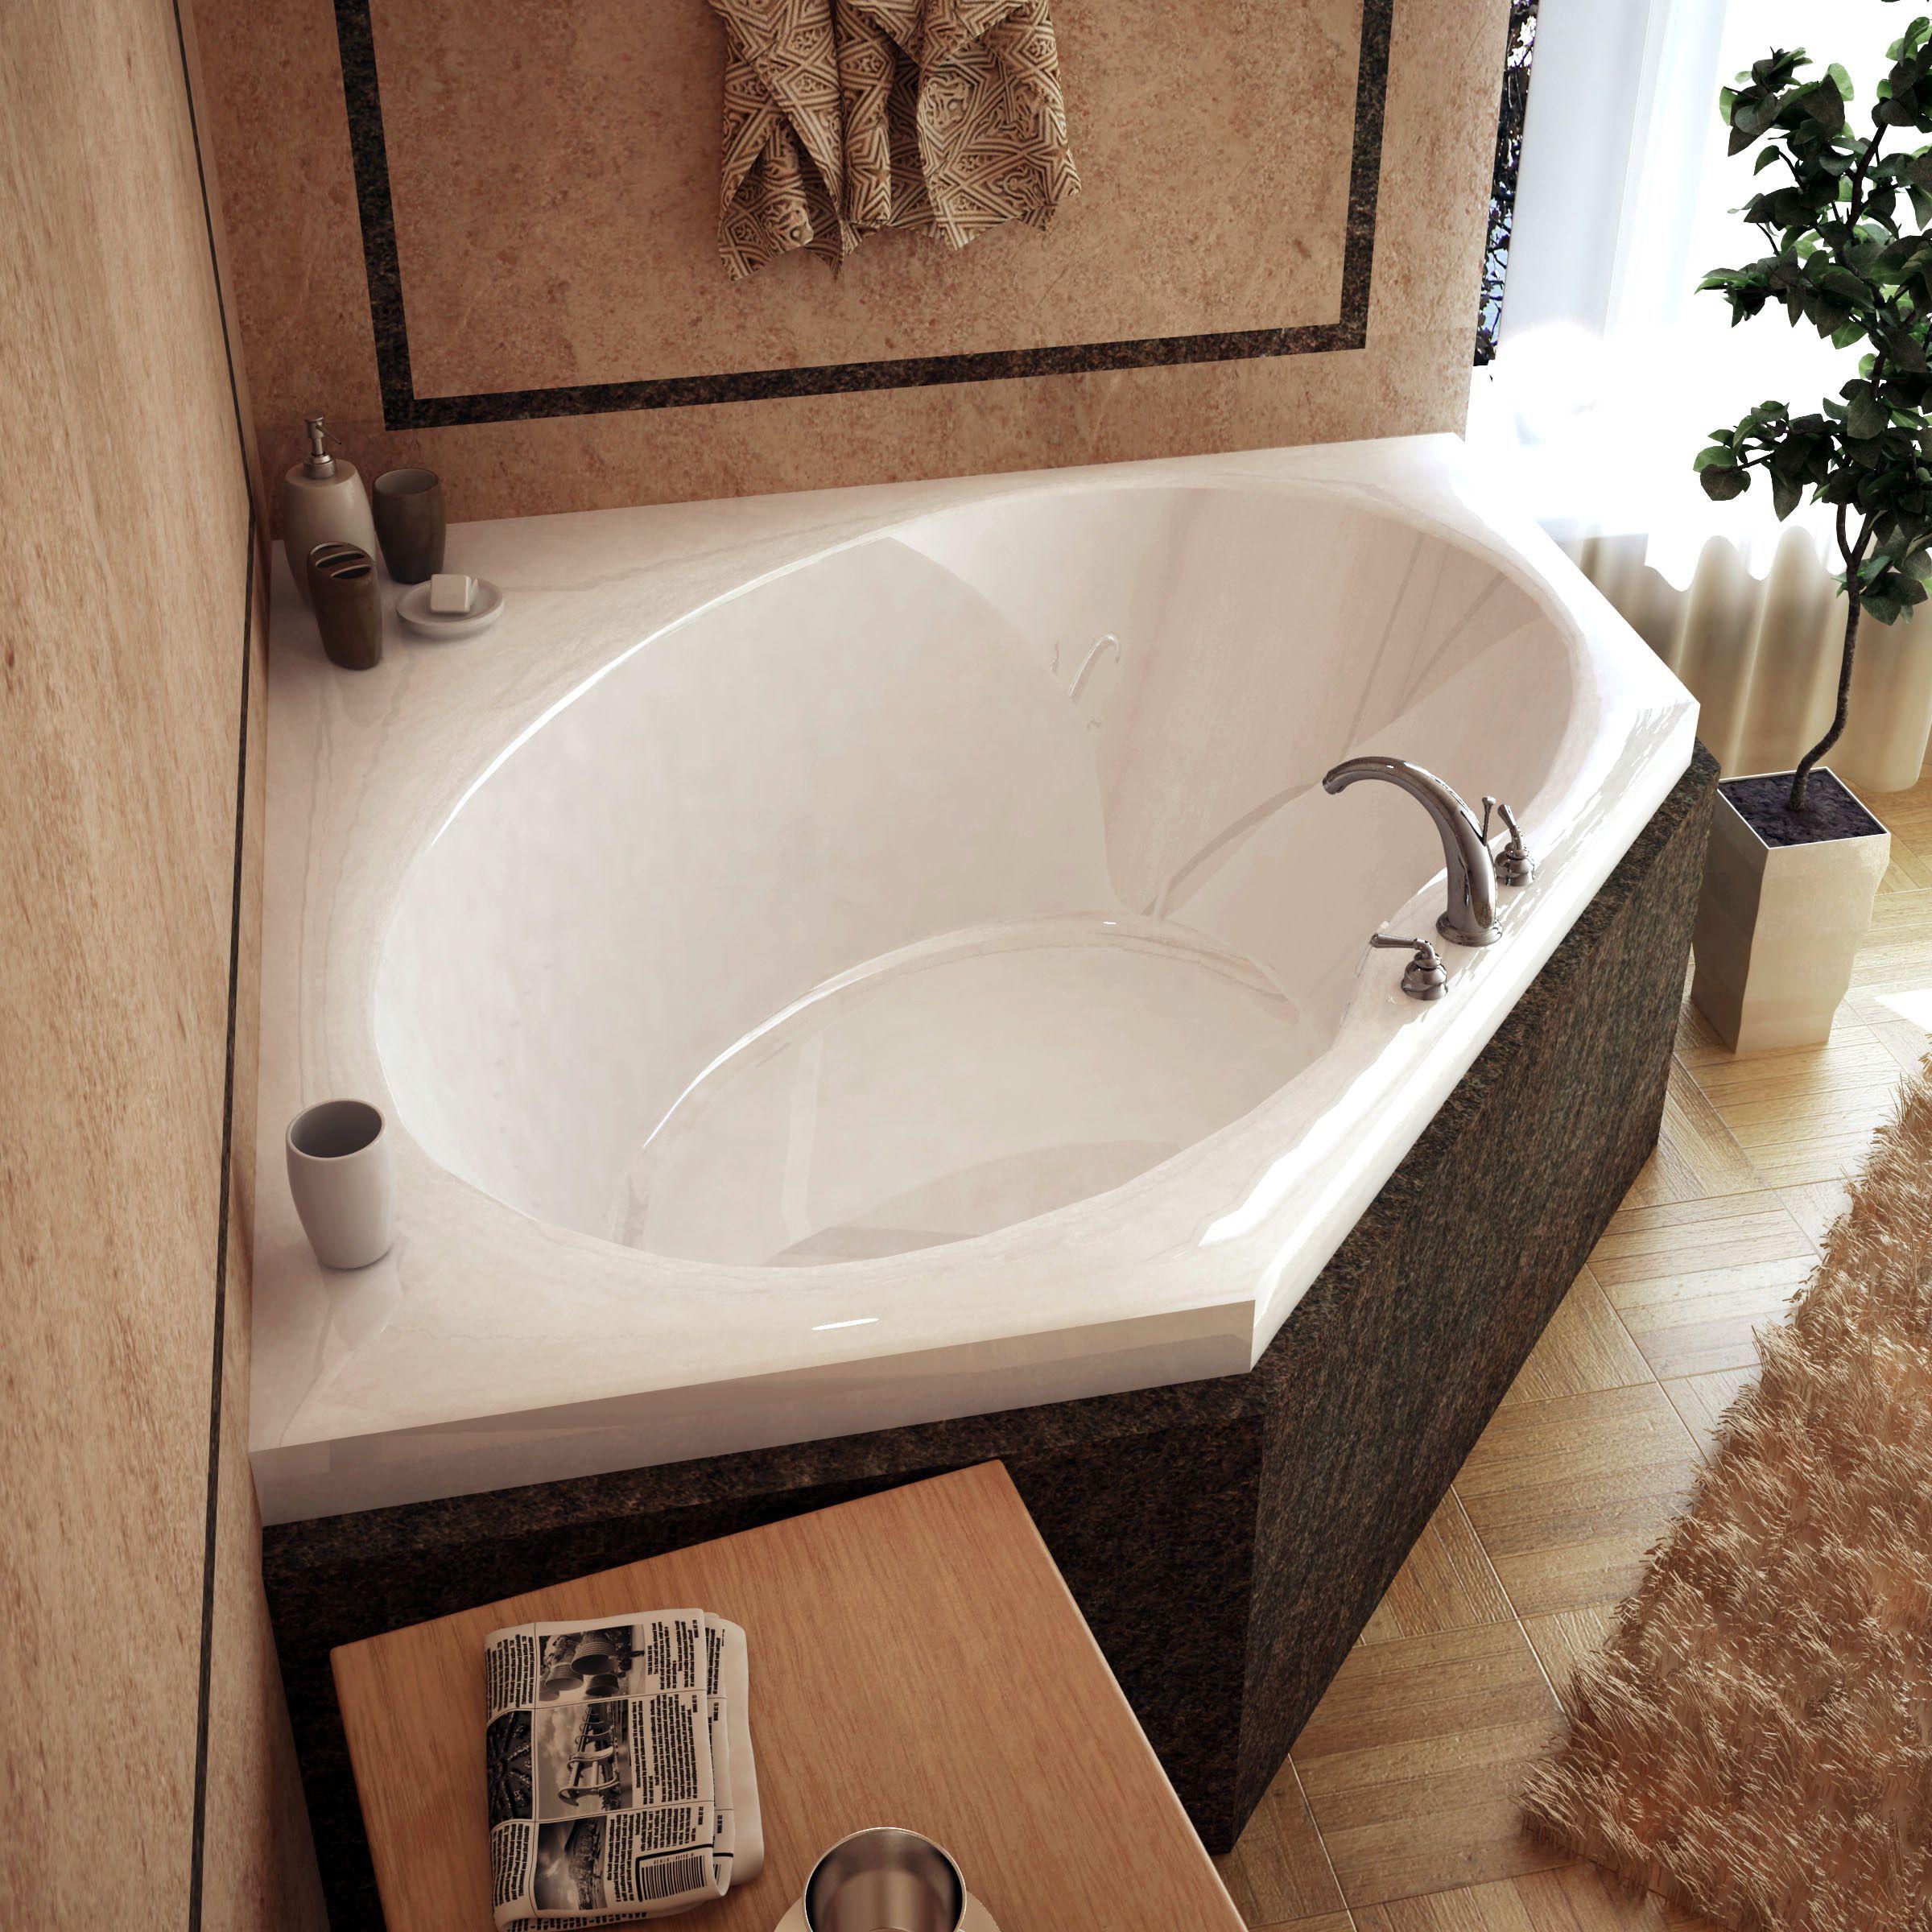 Mountain Home View 60 x 60 Acrylic Soaking Drop-in Bathtub ...